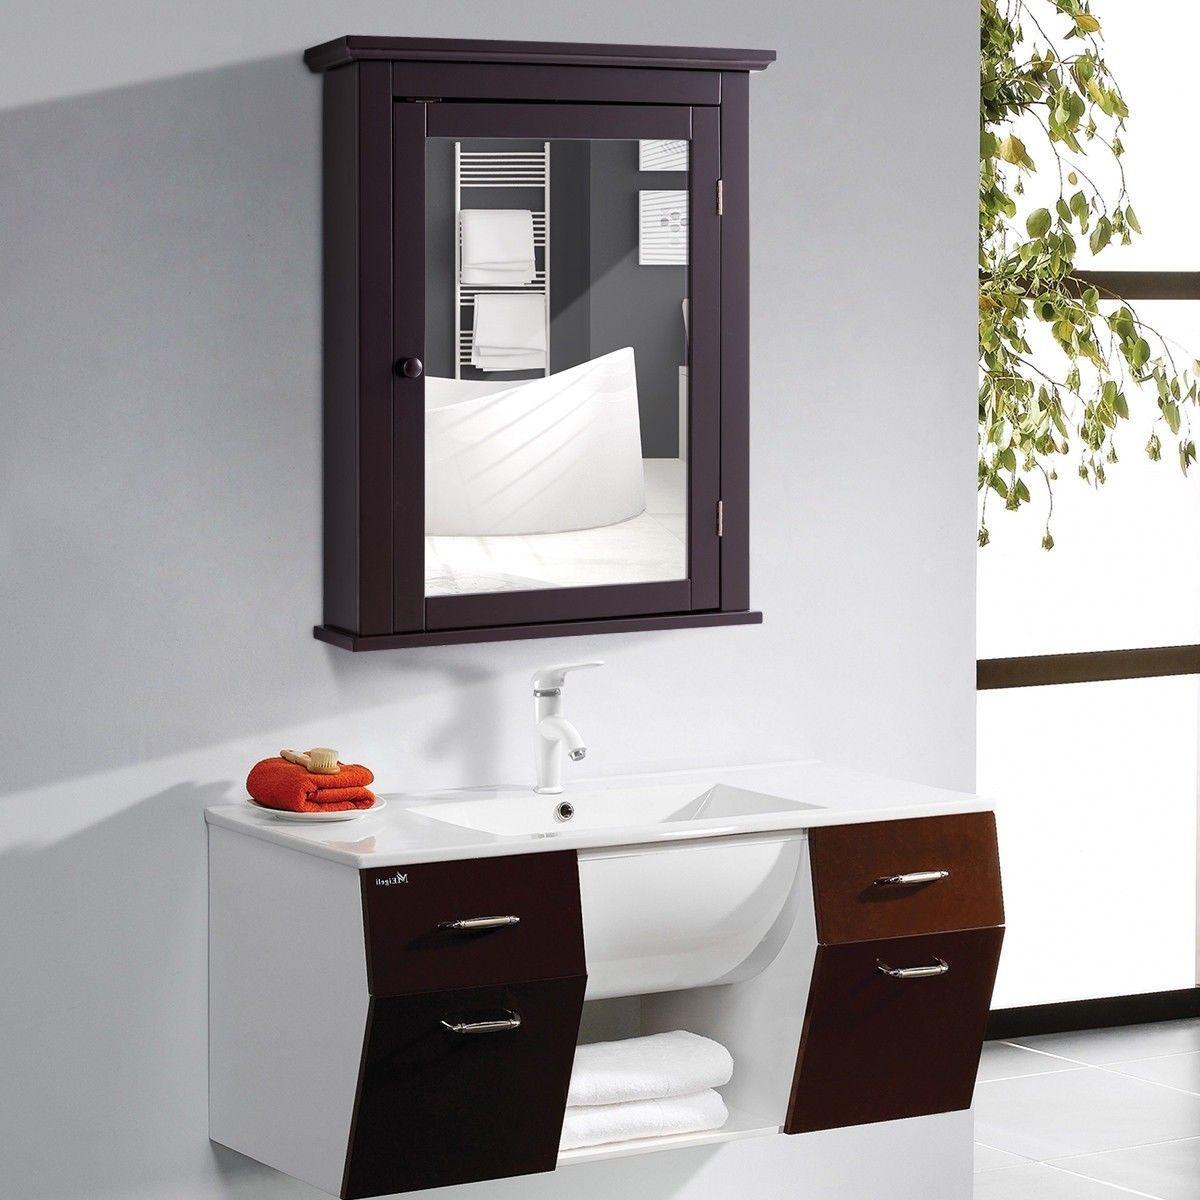 Bathroom Mirror Cabinet Wall Mounted Adjustable Shelf Medicine